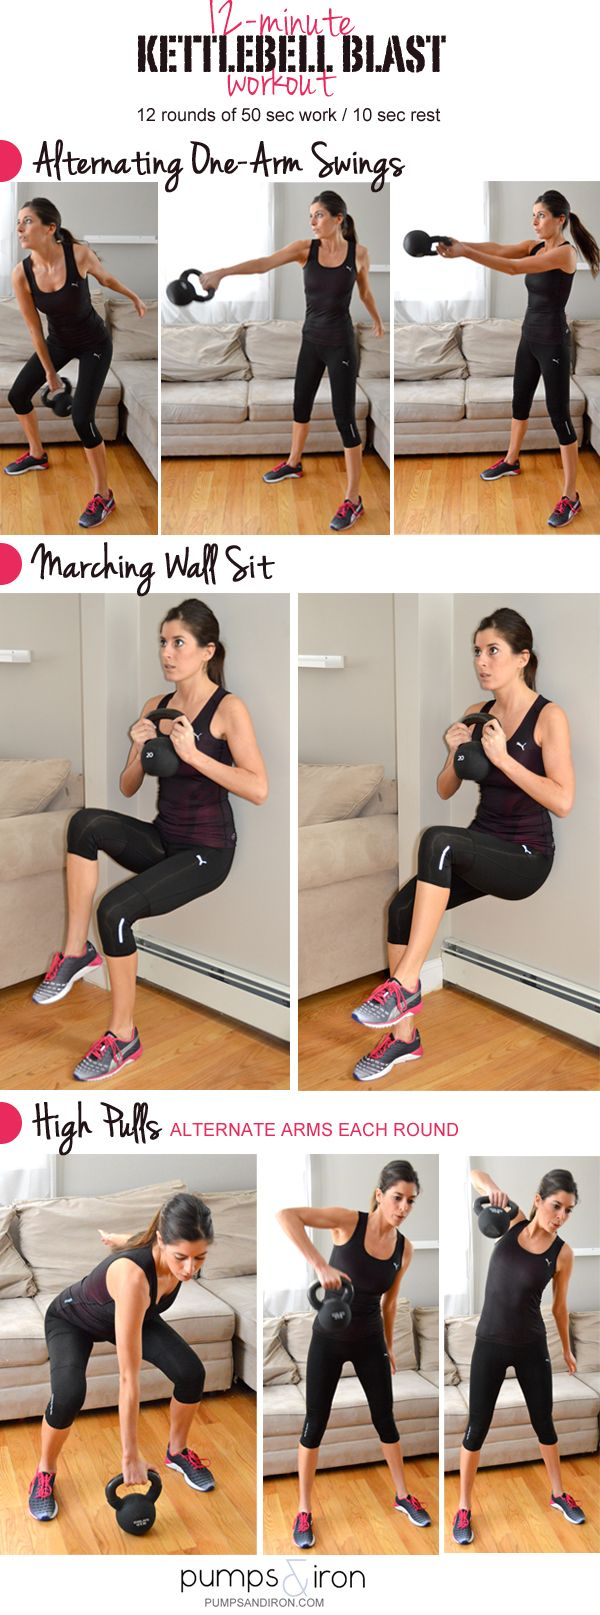 12-Minute Kettlebell Blast Workout